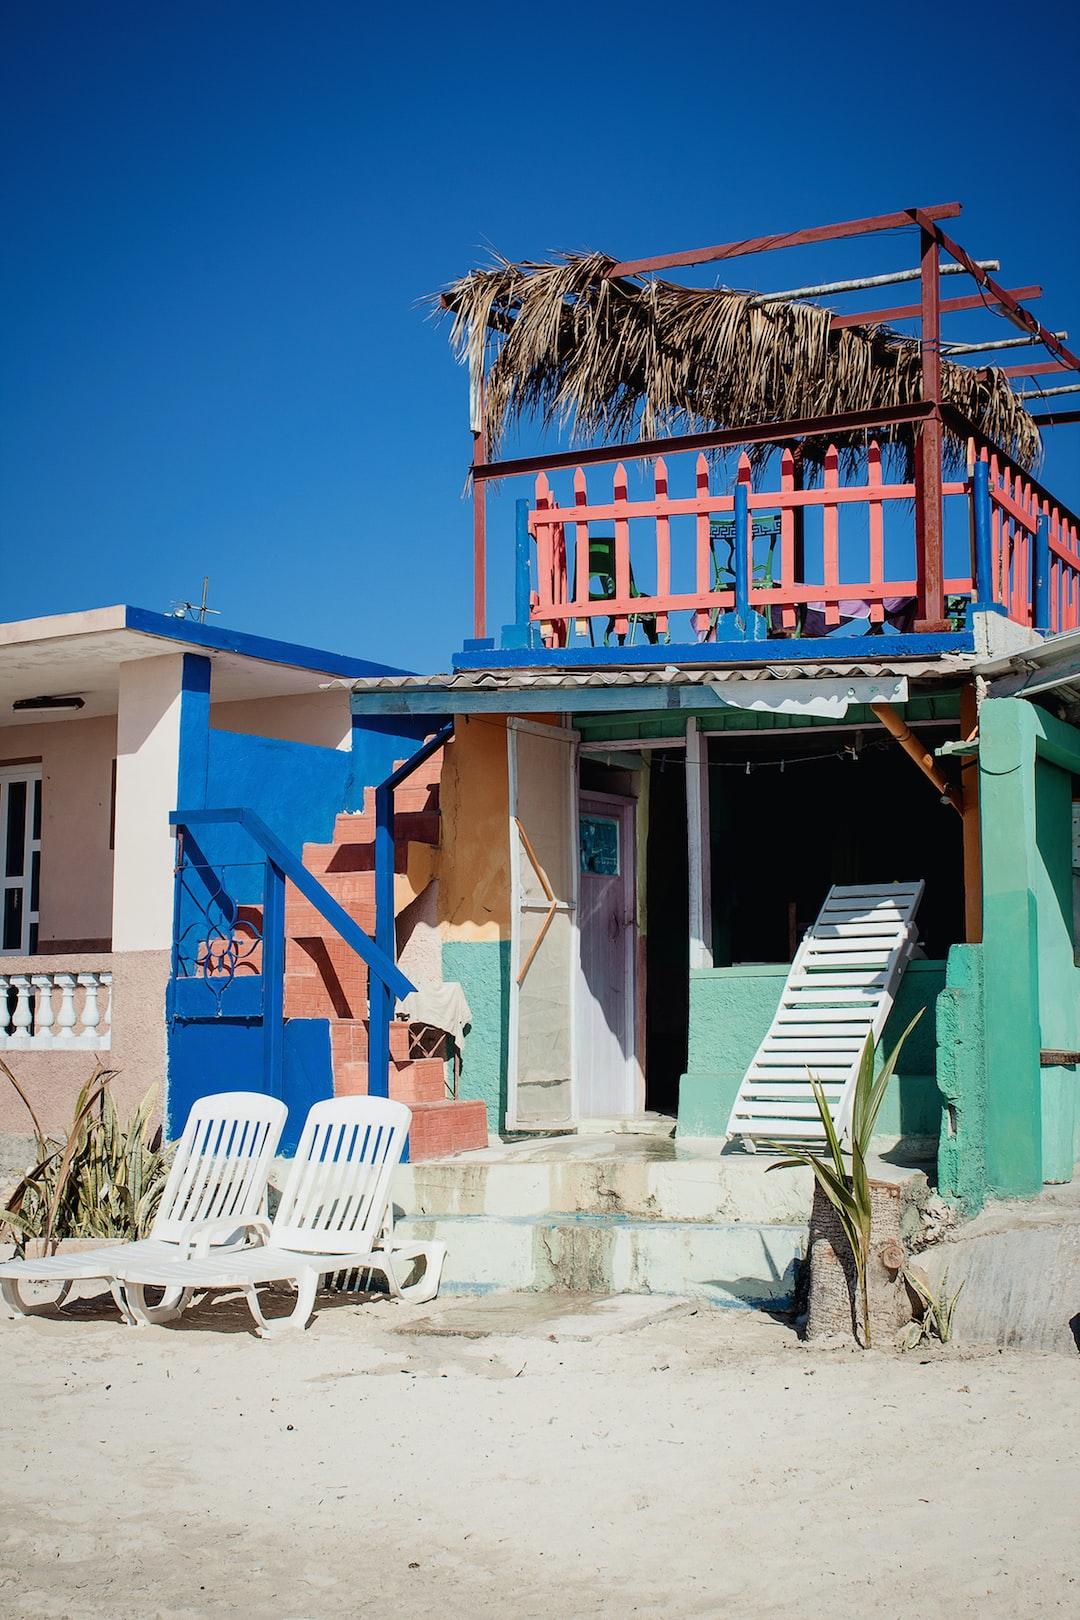 small house, straw roof, deckchair, beach, blue sky, roof top, cuba, playa larga